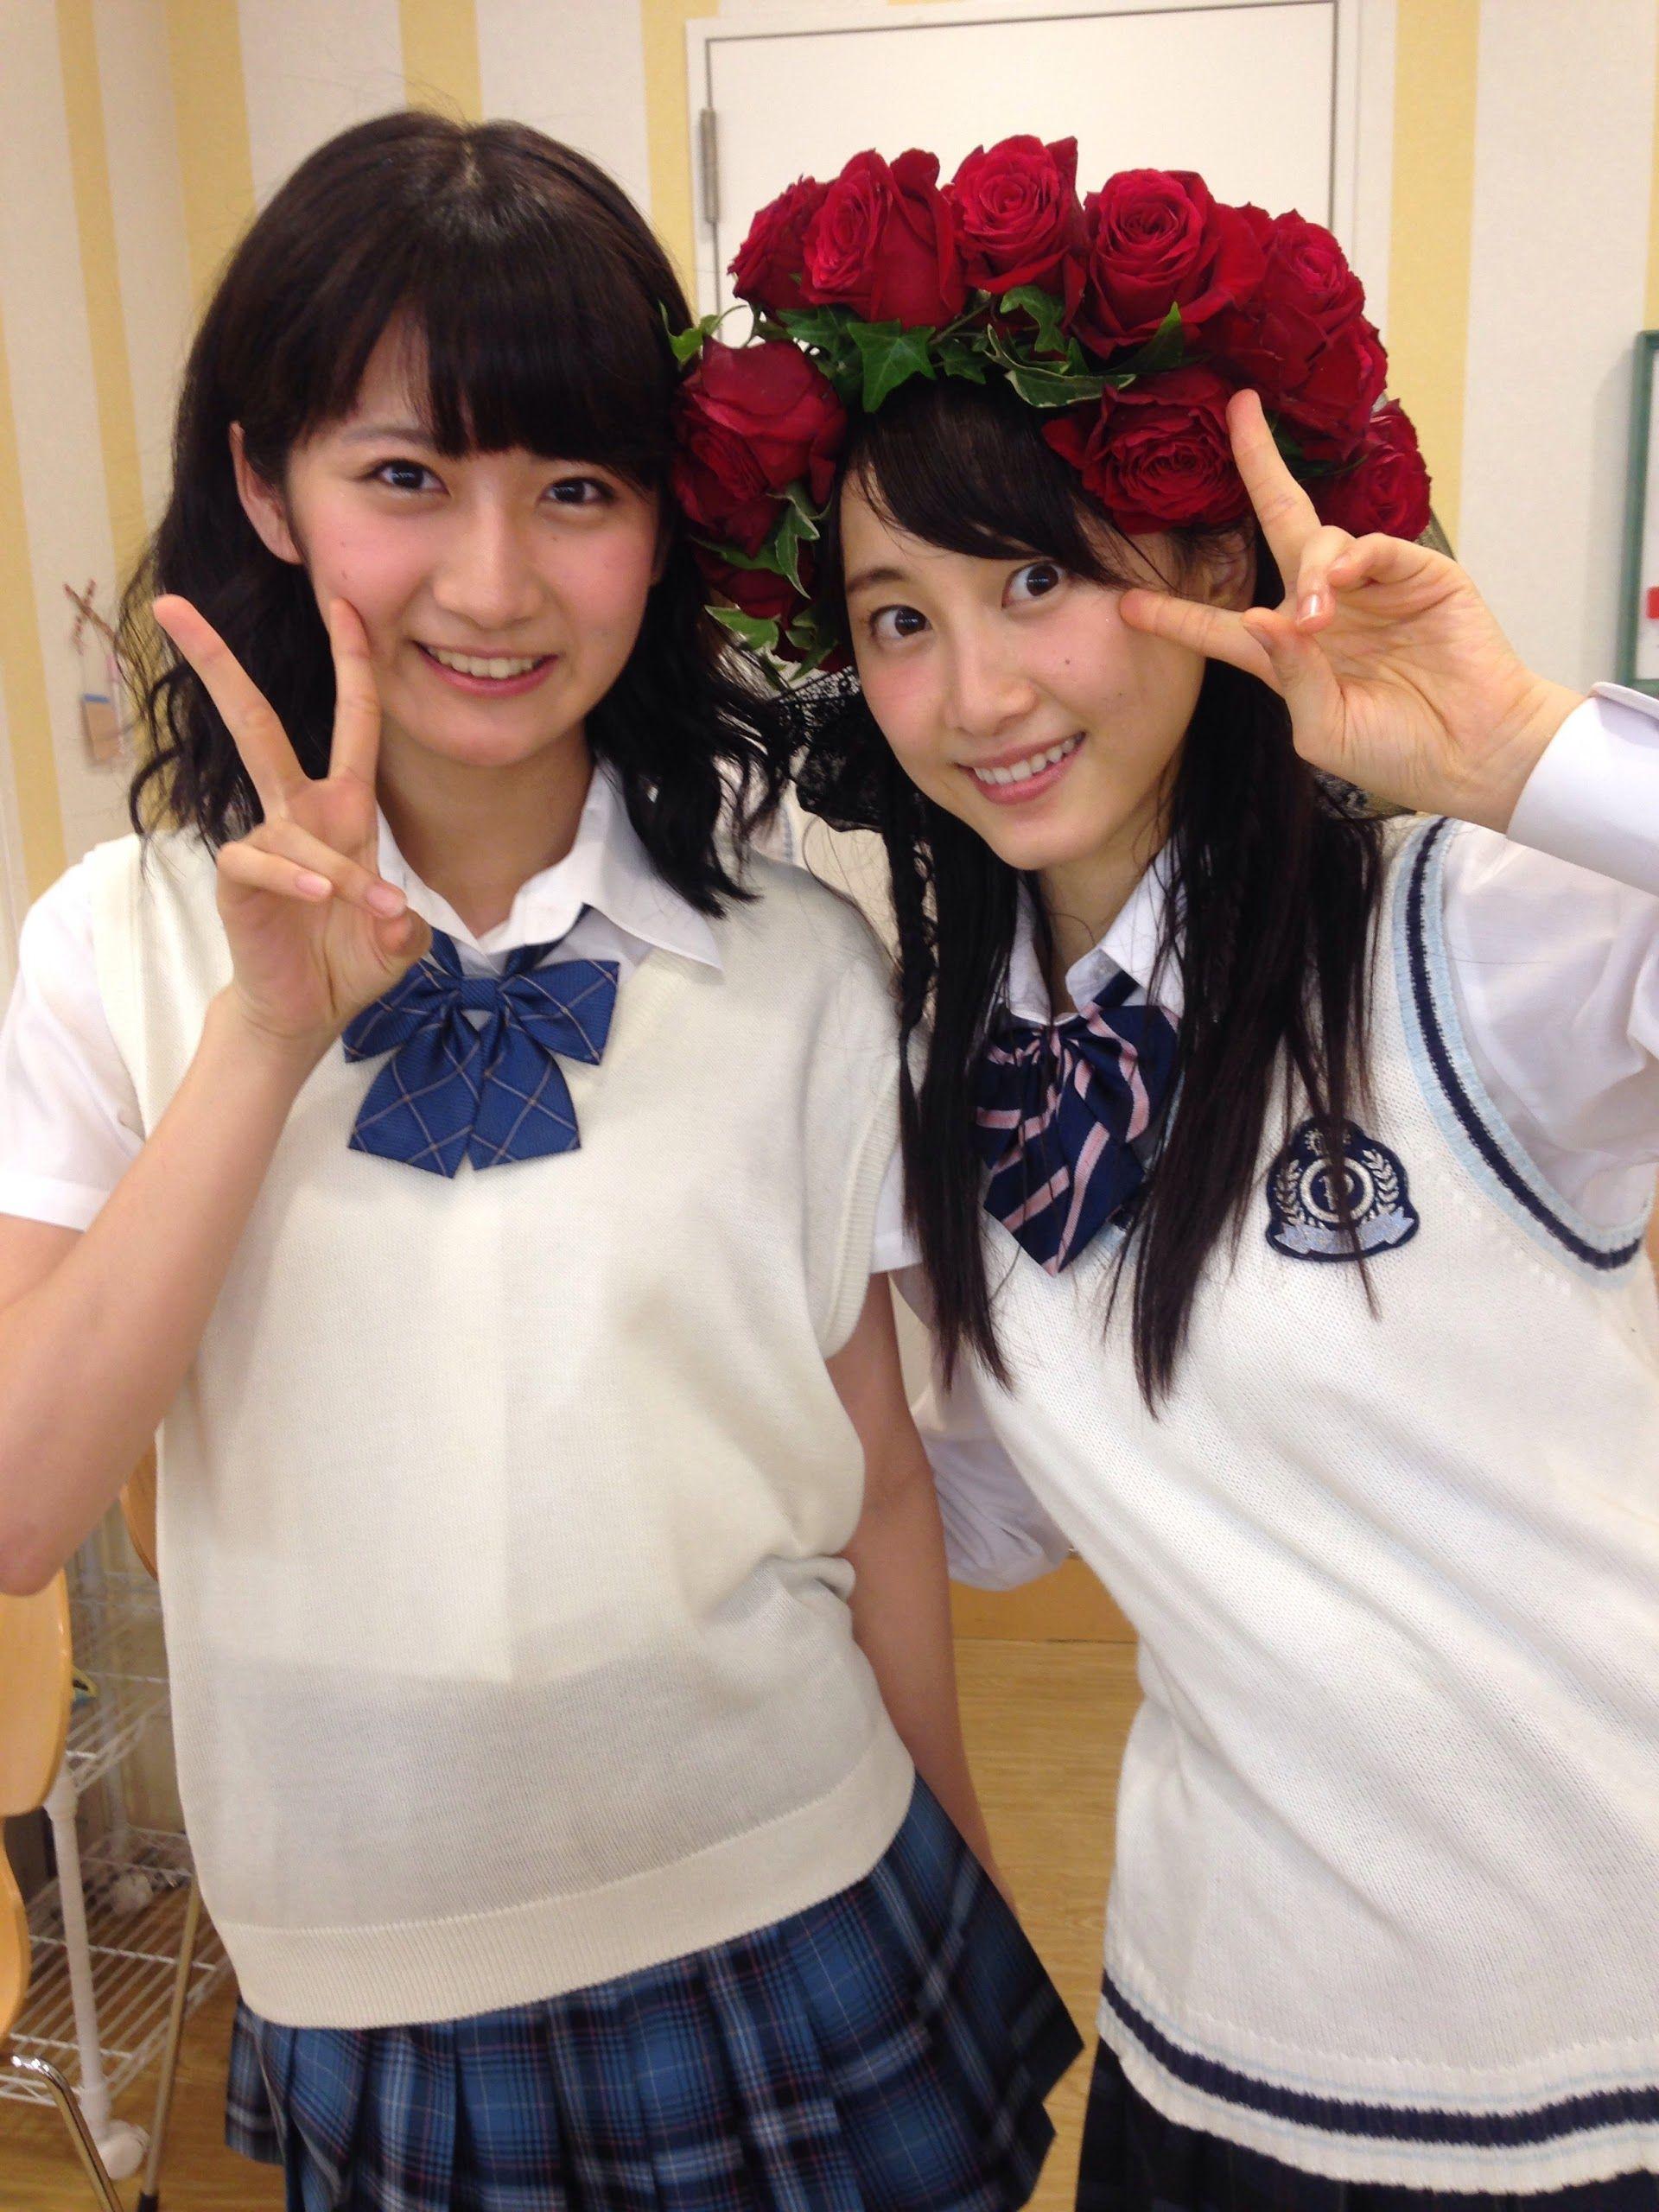 Saki Godo x Rena Matsui  https://plus.google.com/u/0/112406210639671404336/posts/eNmbRQZptZe